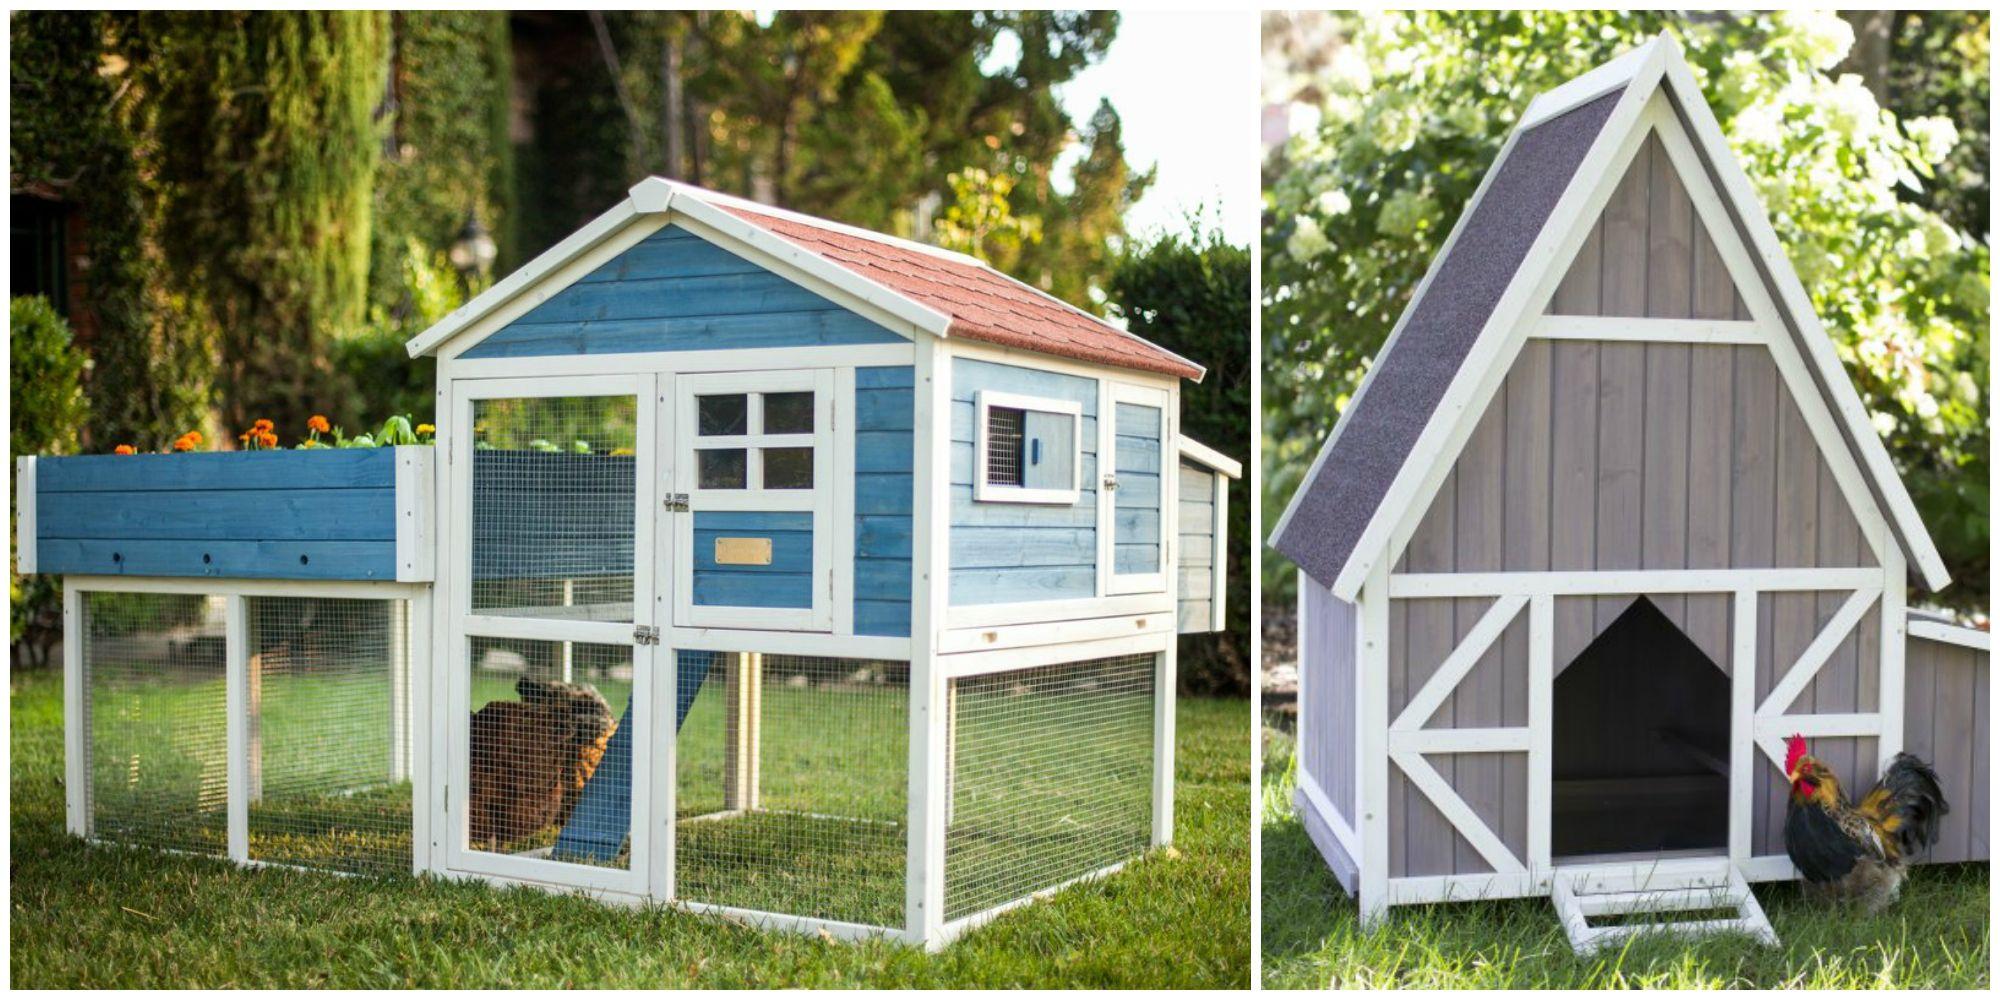 Backyard Chicken Coop Kit backyard chicken coop kit - backyard chicken coop kits